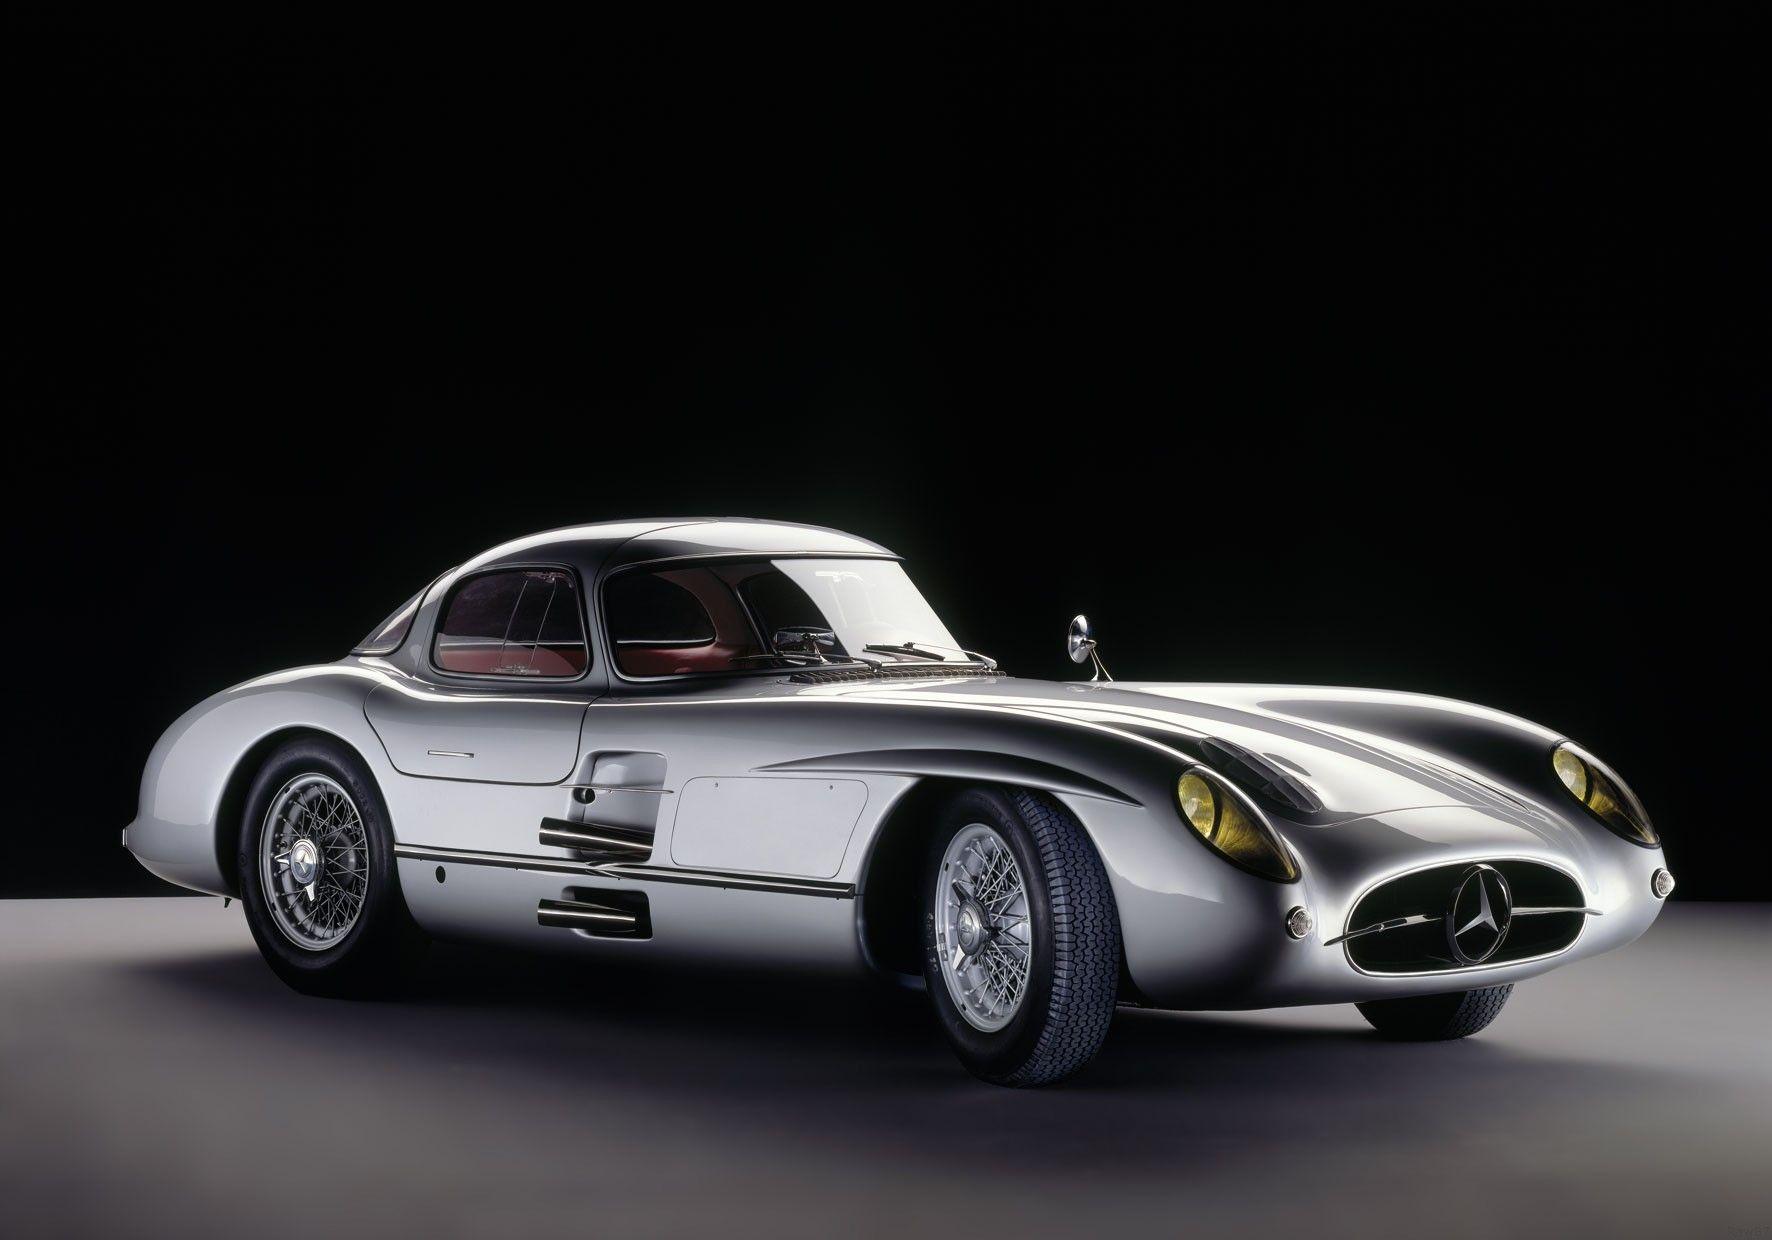 Mercedes benz 300 slr classic cars pinterest for Mercedes benz 300 slr